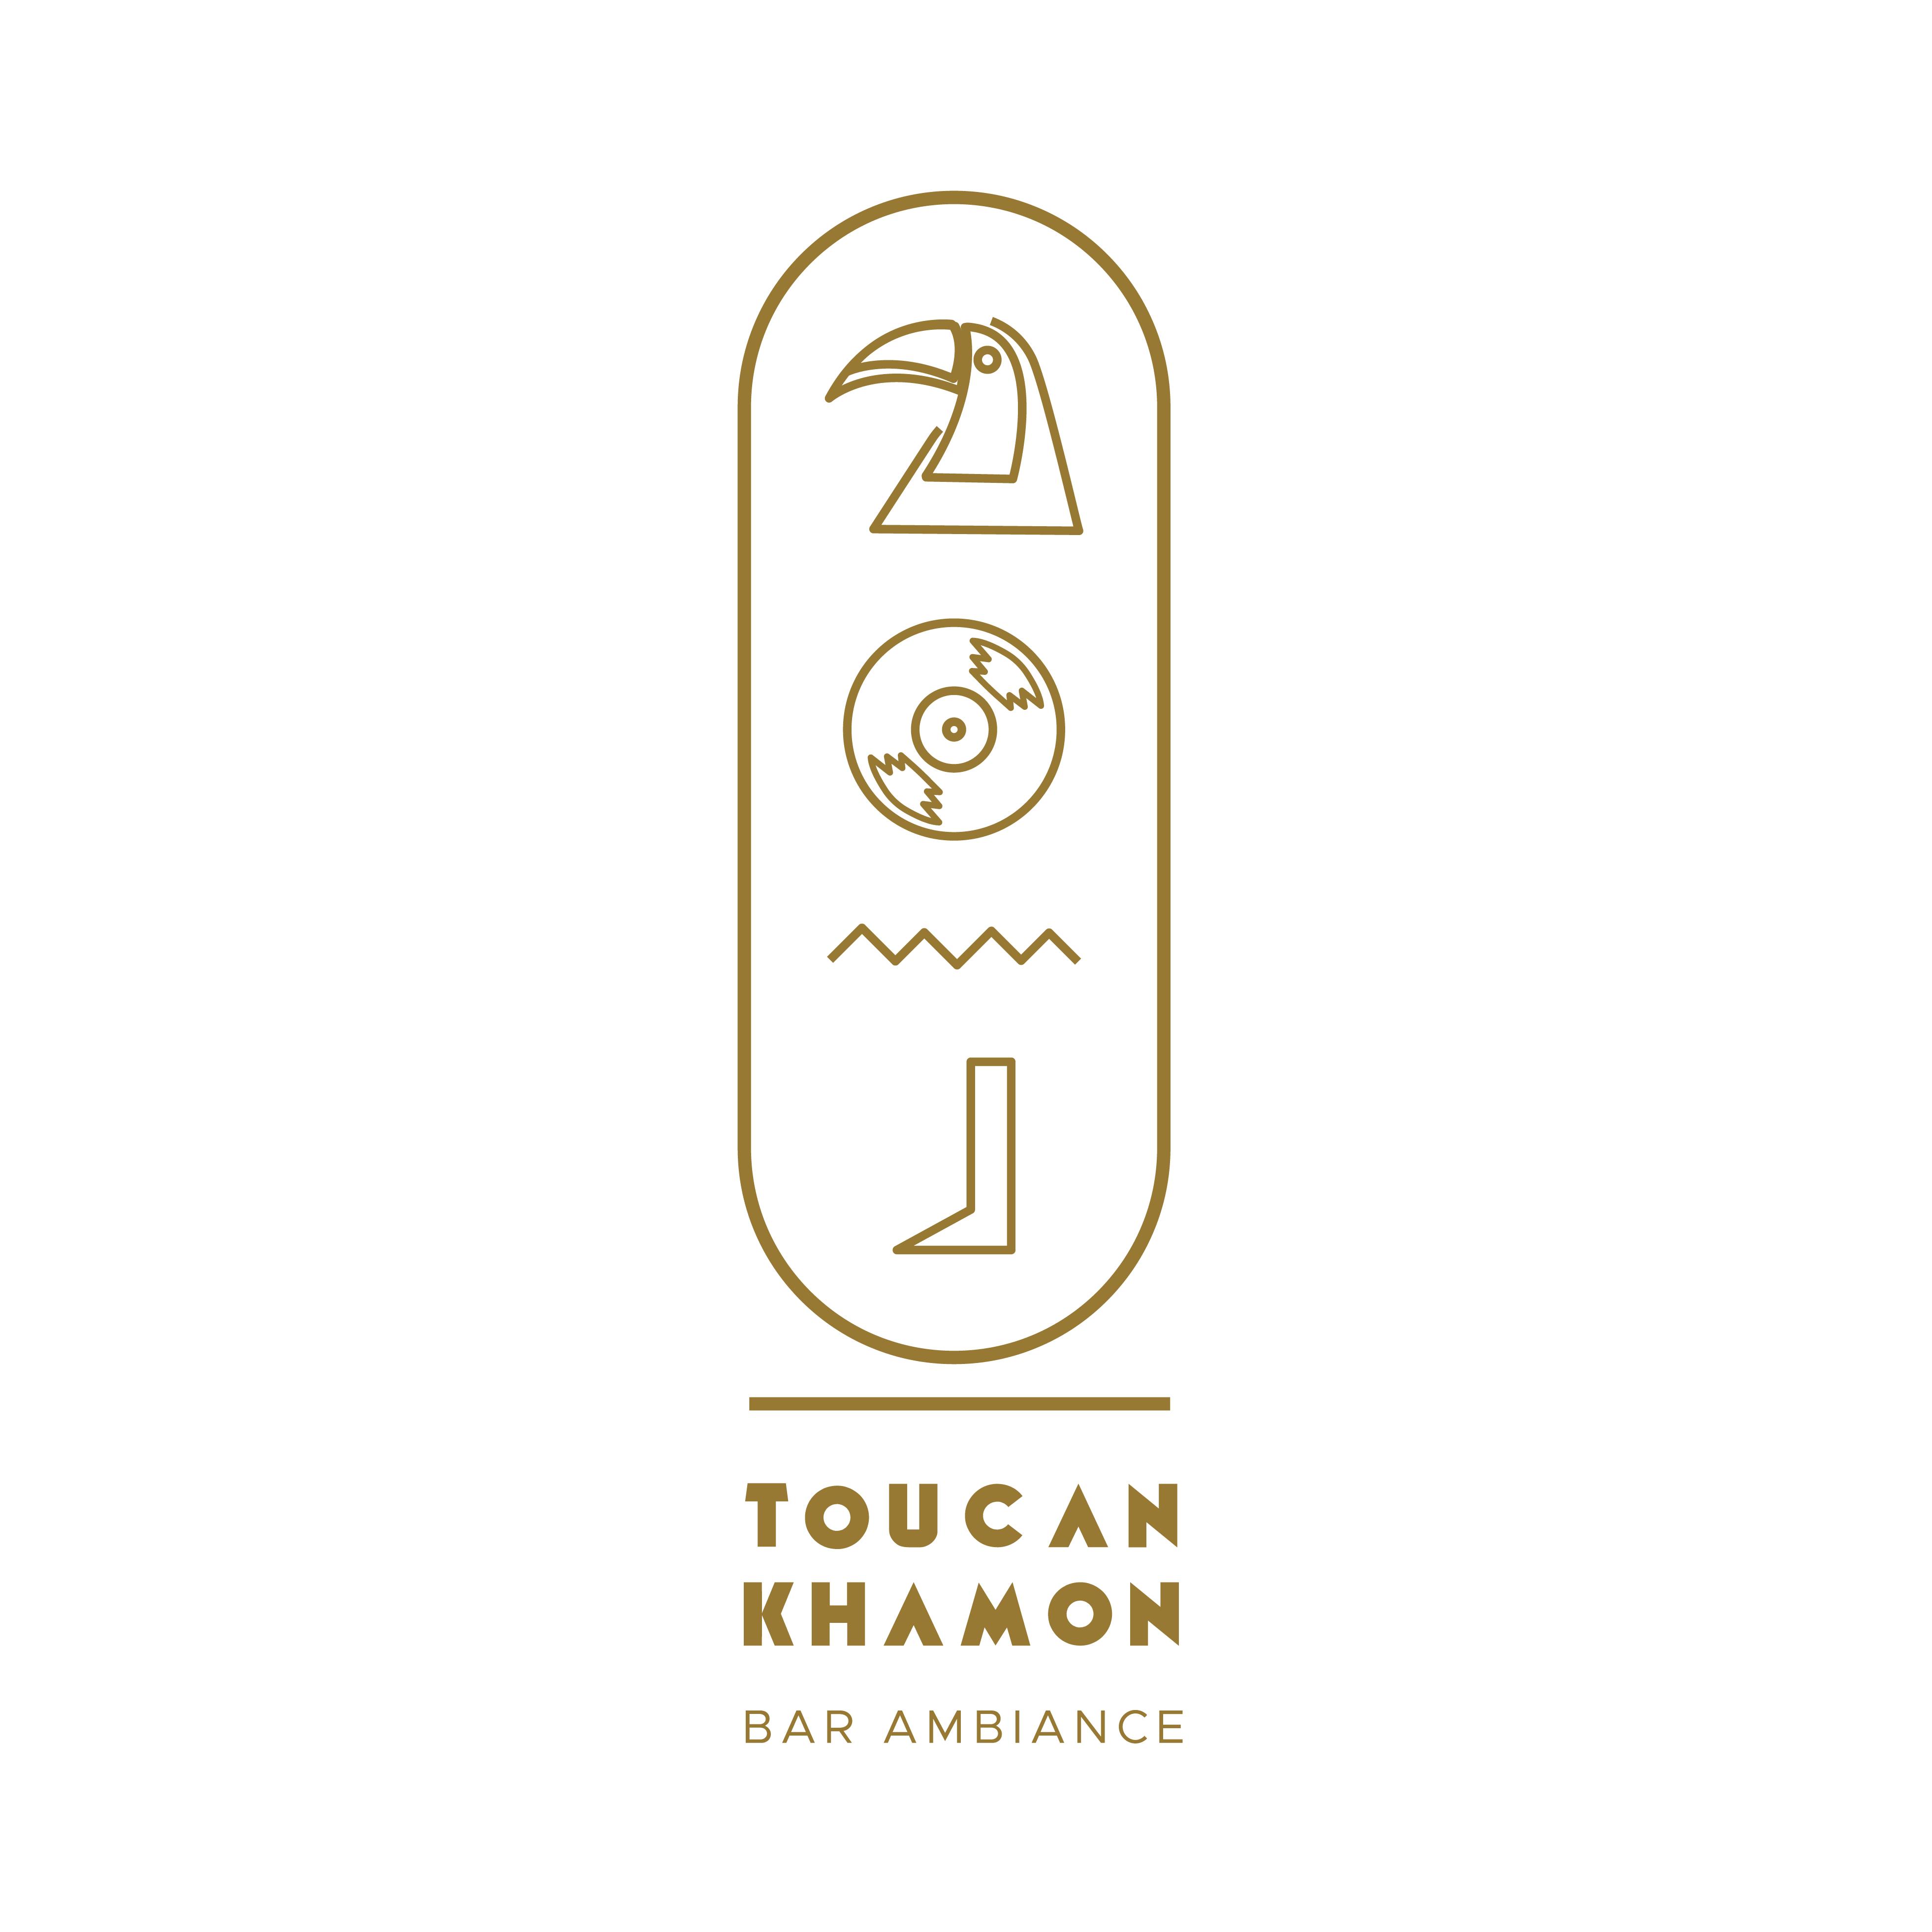 logo bar ambiance toucankahmon